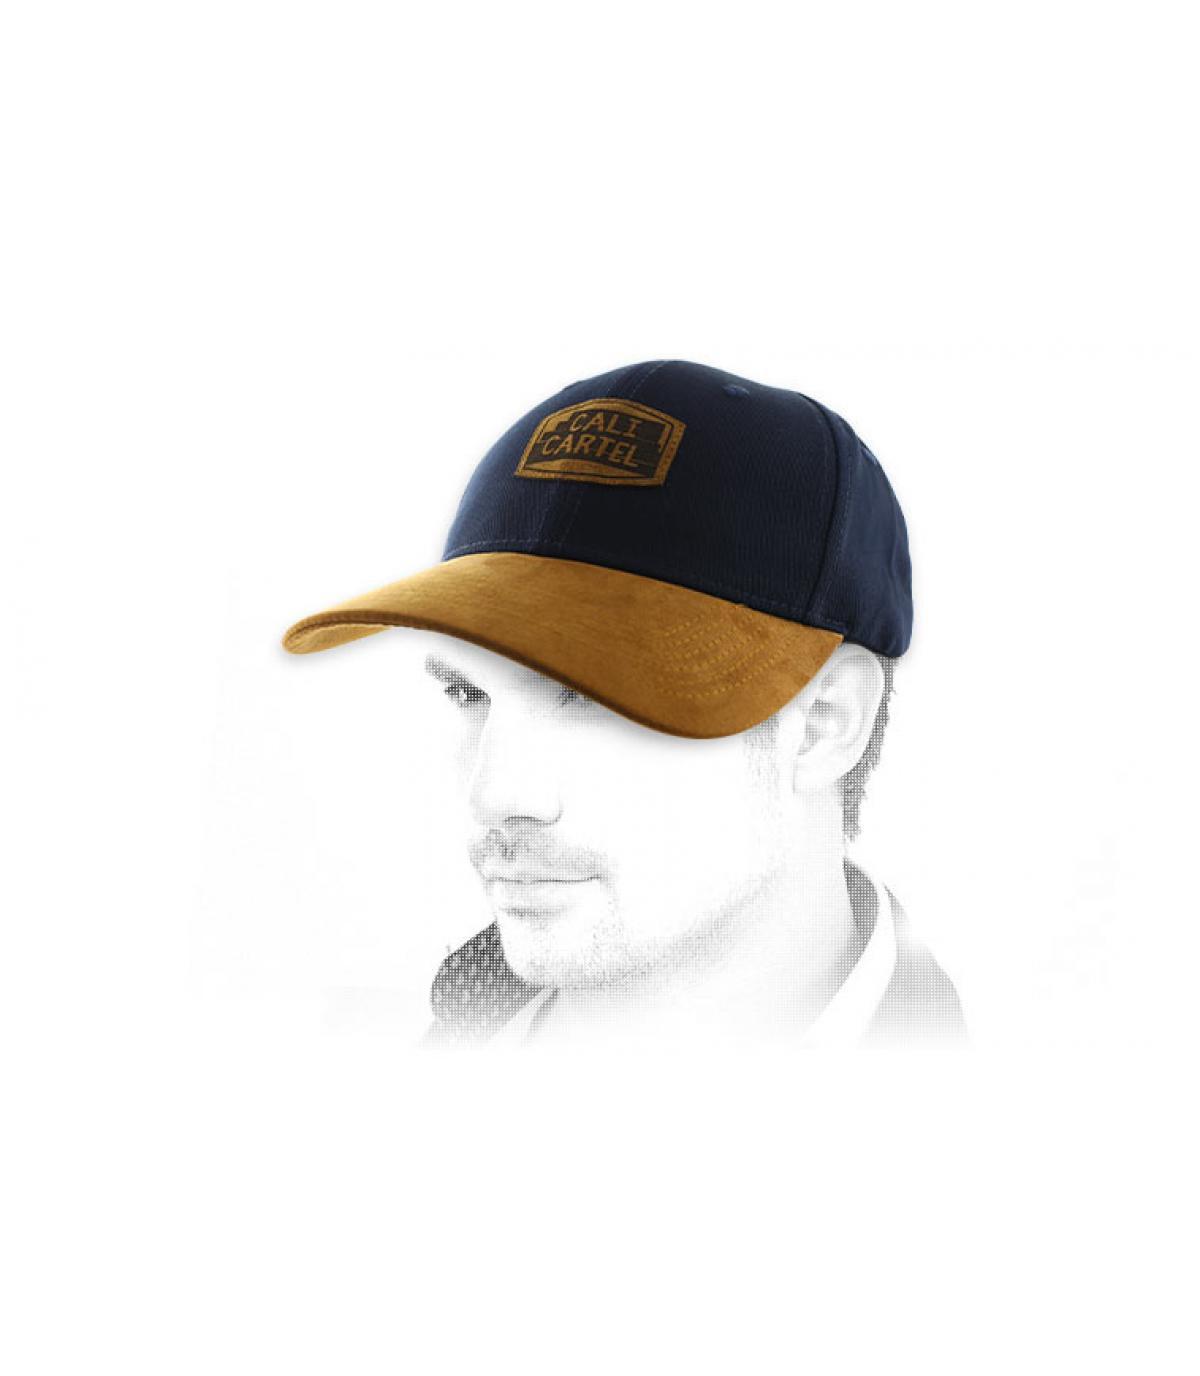 blue Cali Cartel cap